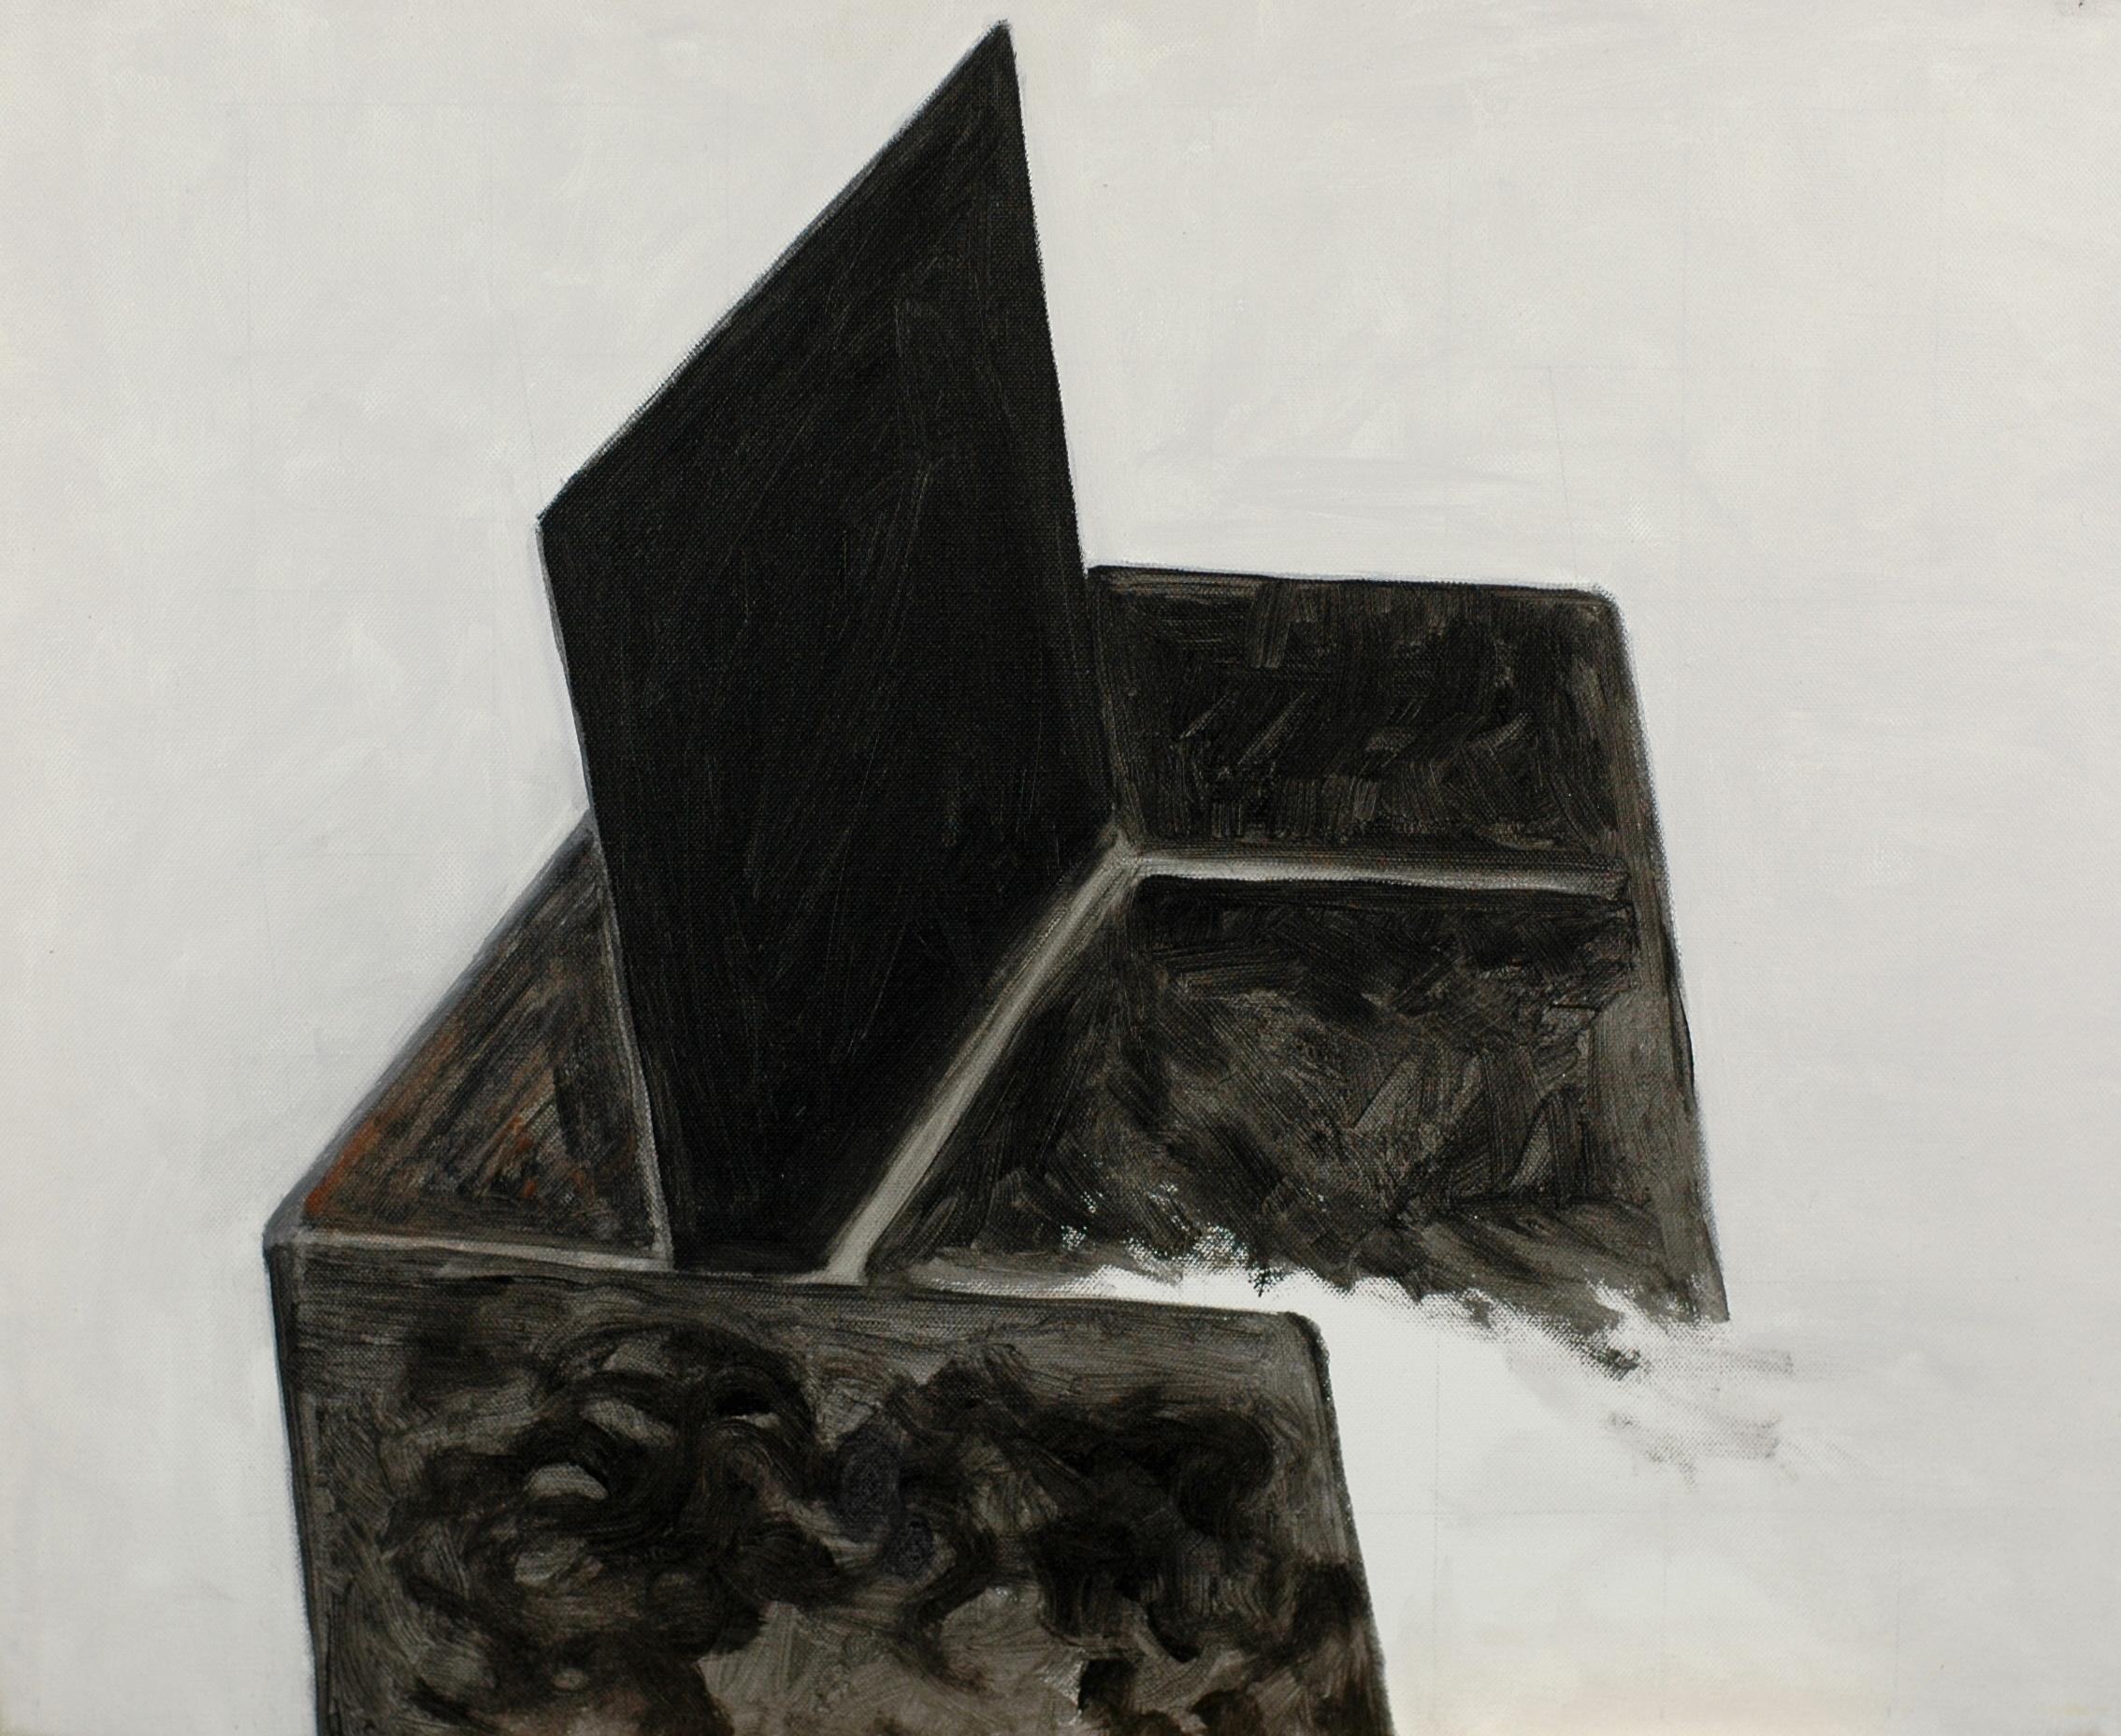 Fireplace 2, 2005